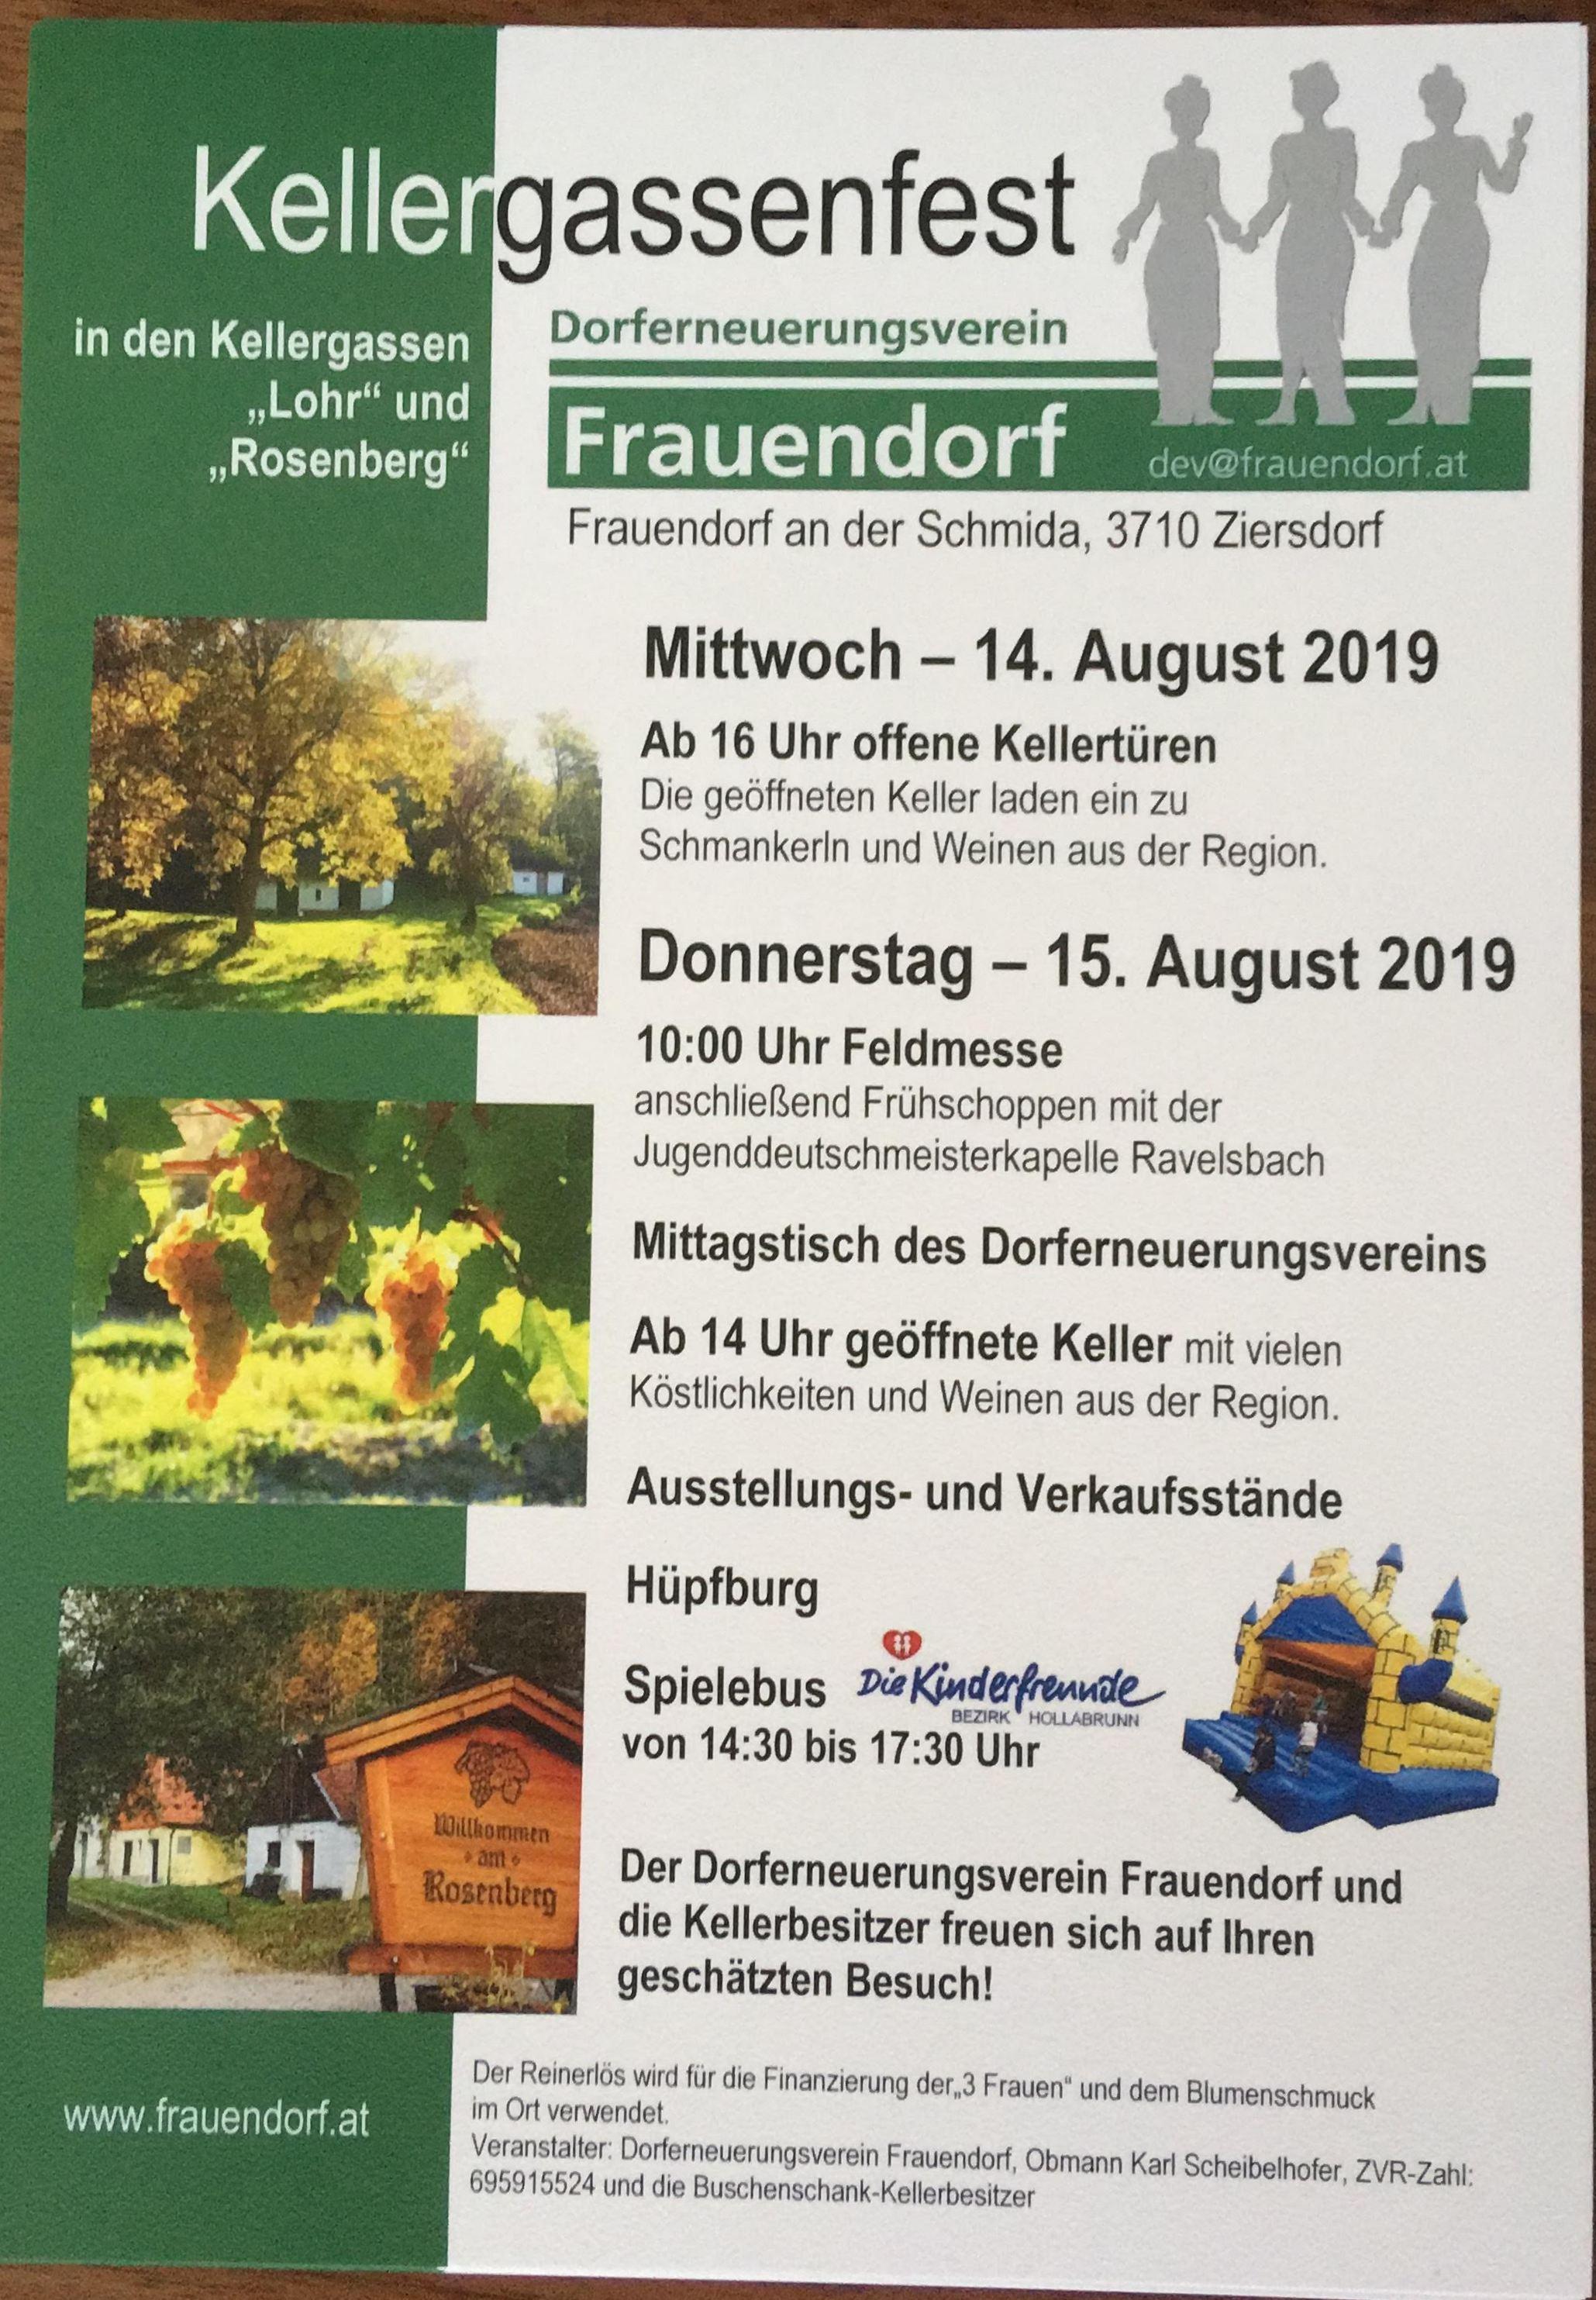 Kellergassenfest 2019